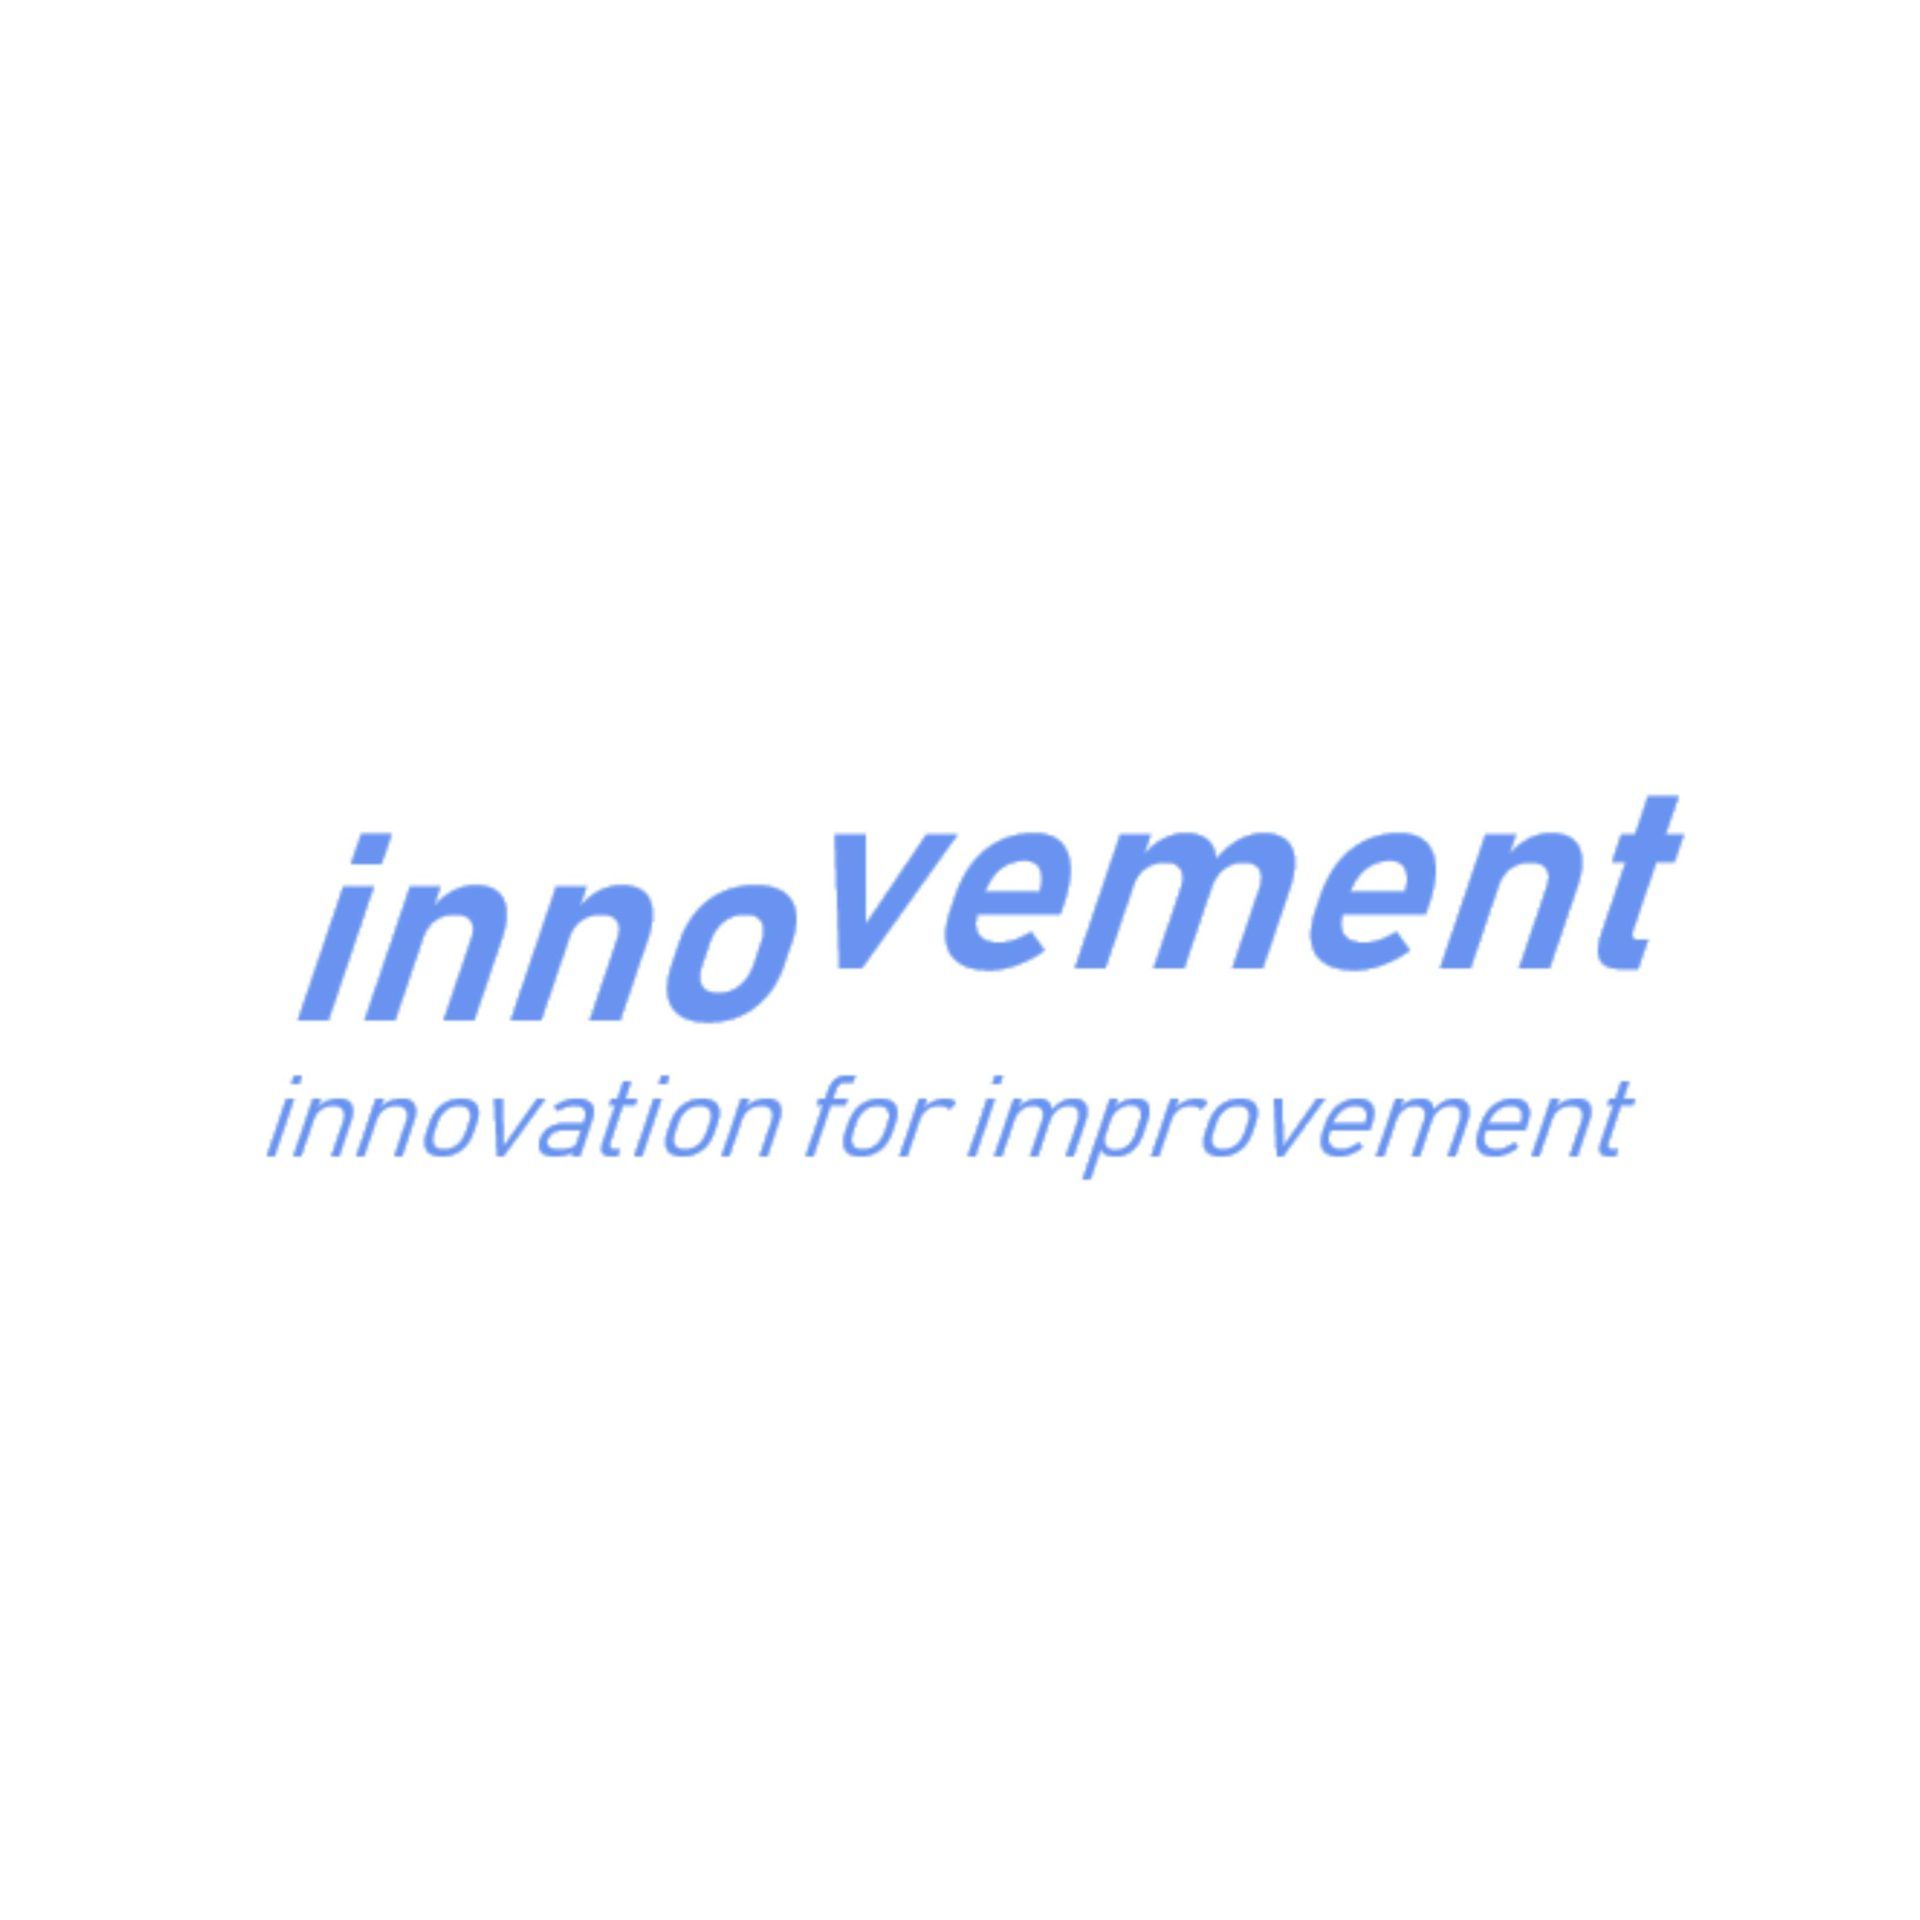 innovement